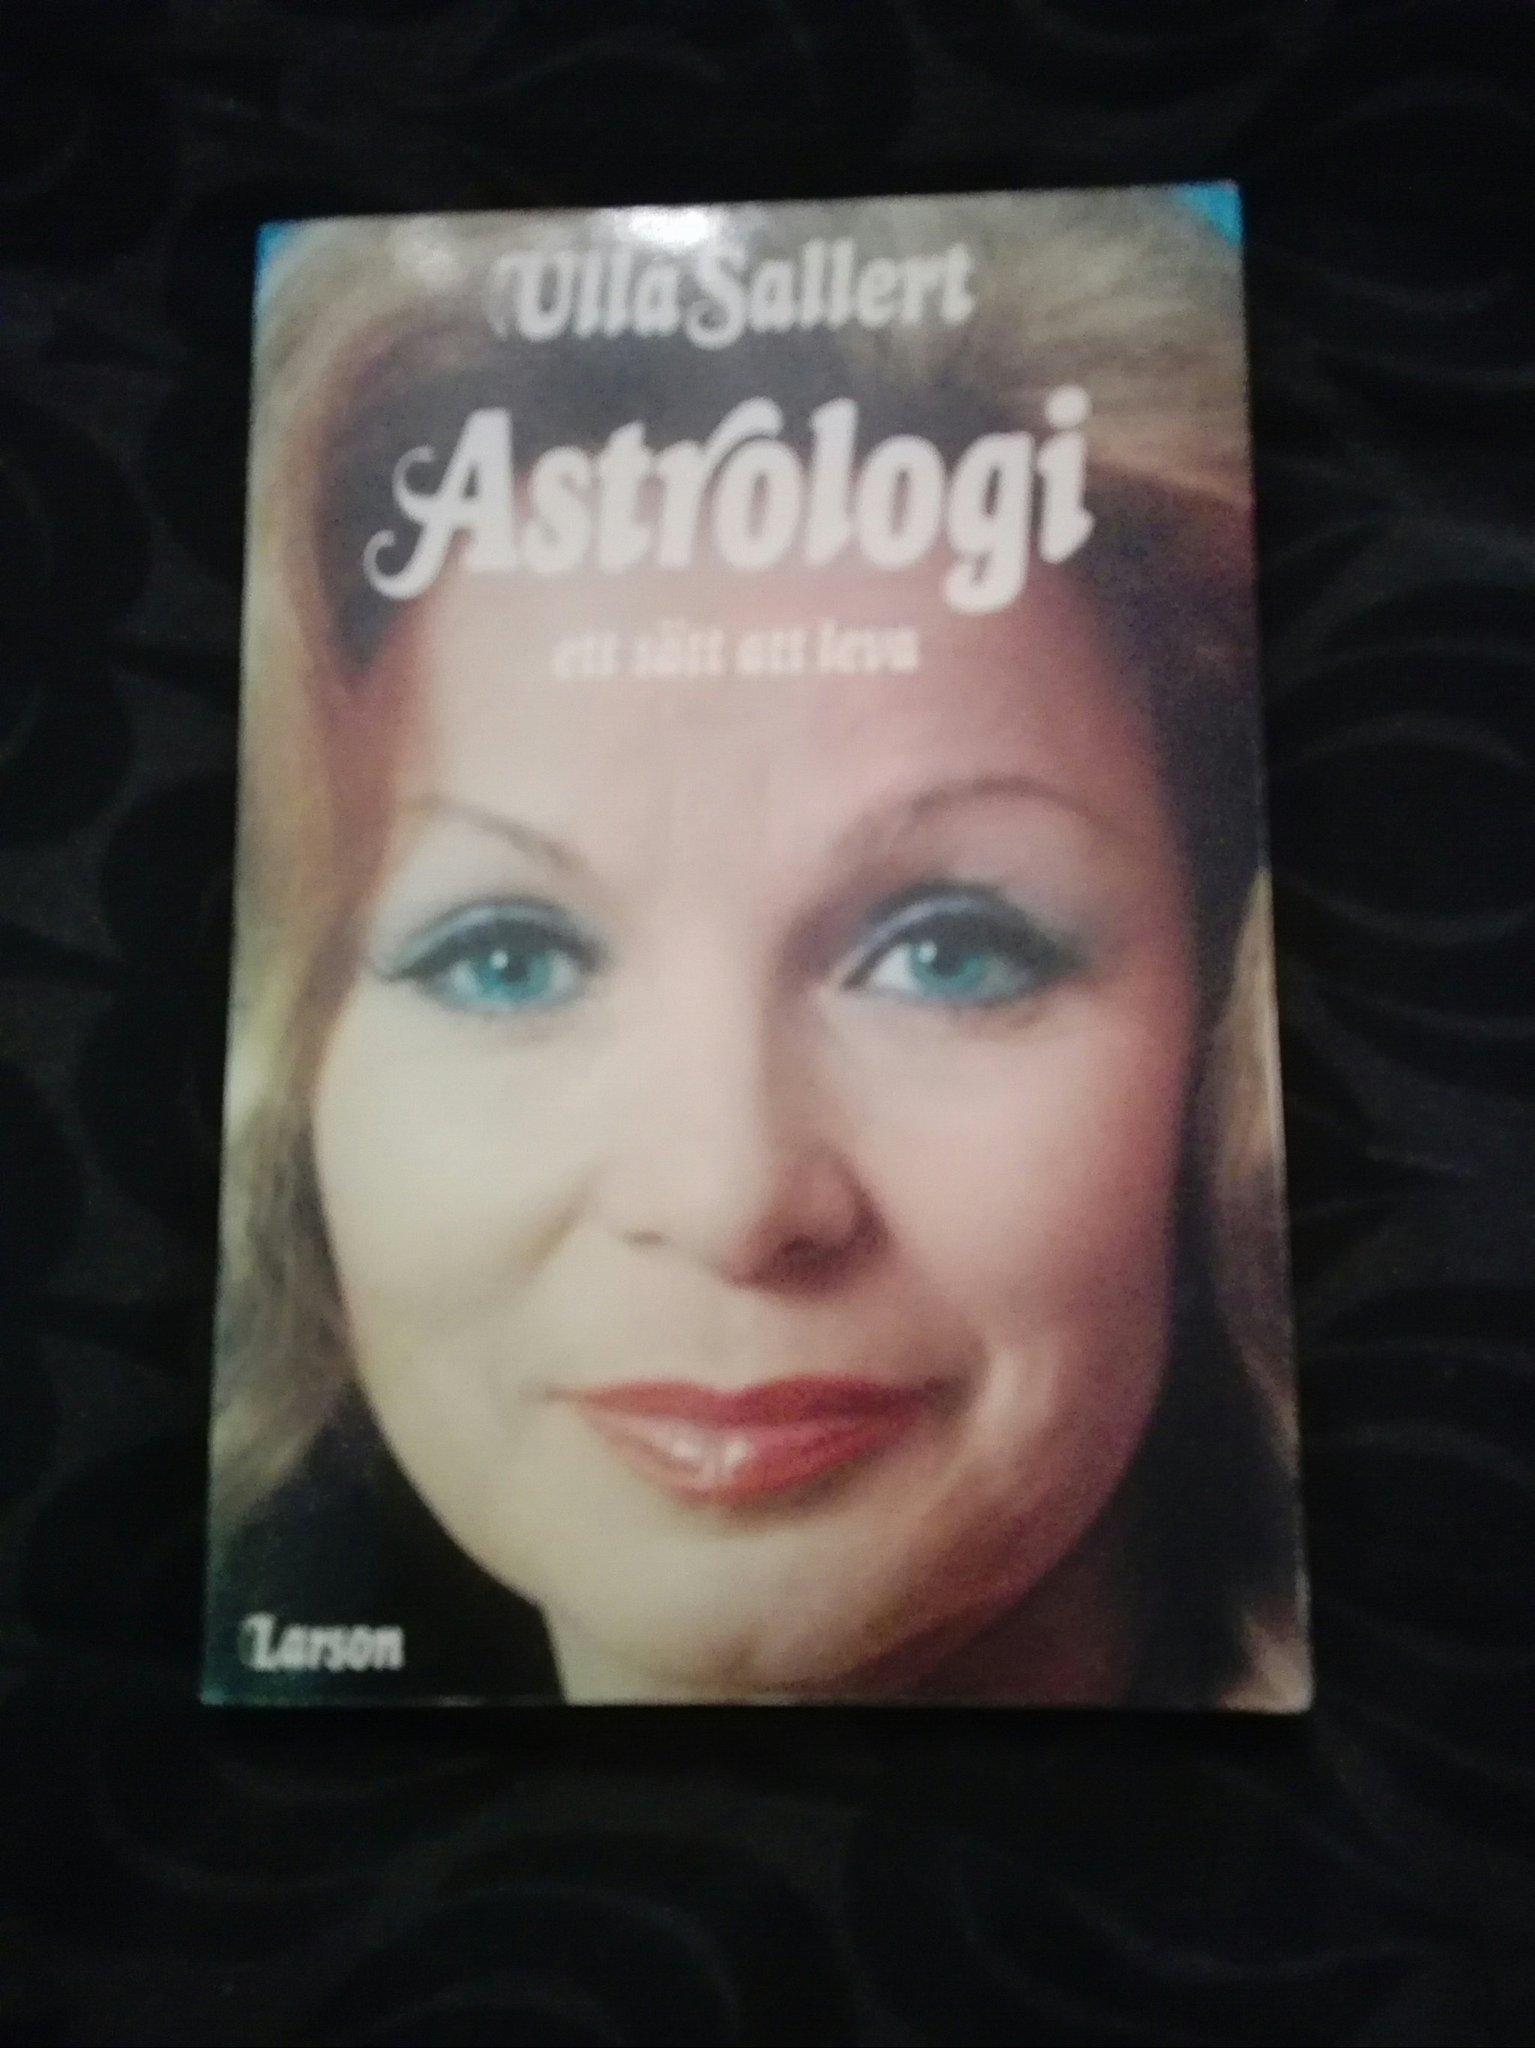 ulla sallert astrologi